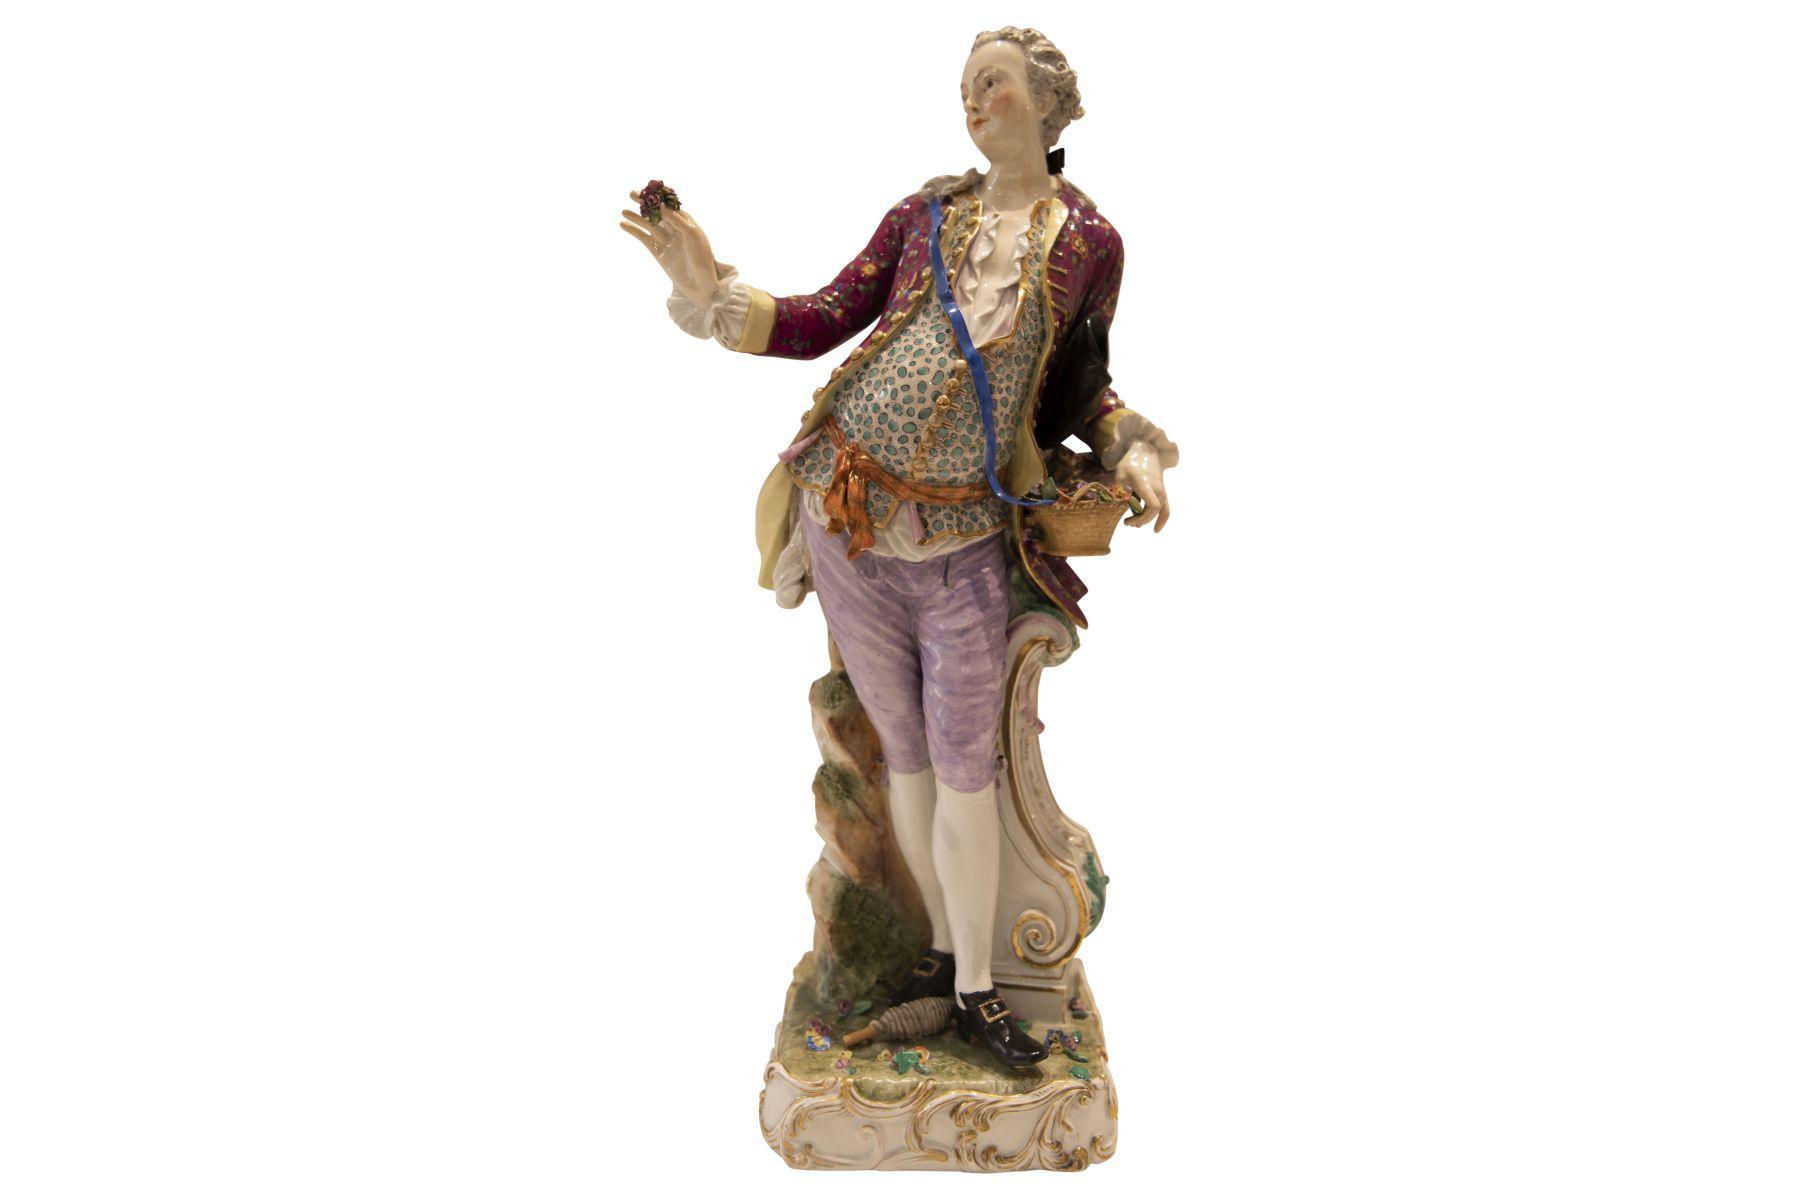 "#267 Large figure ""Cavalier with flowers"", Meissen   Große Figur ""Kavalier mit Blumen"", Meissen Image"